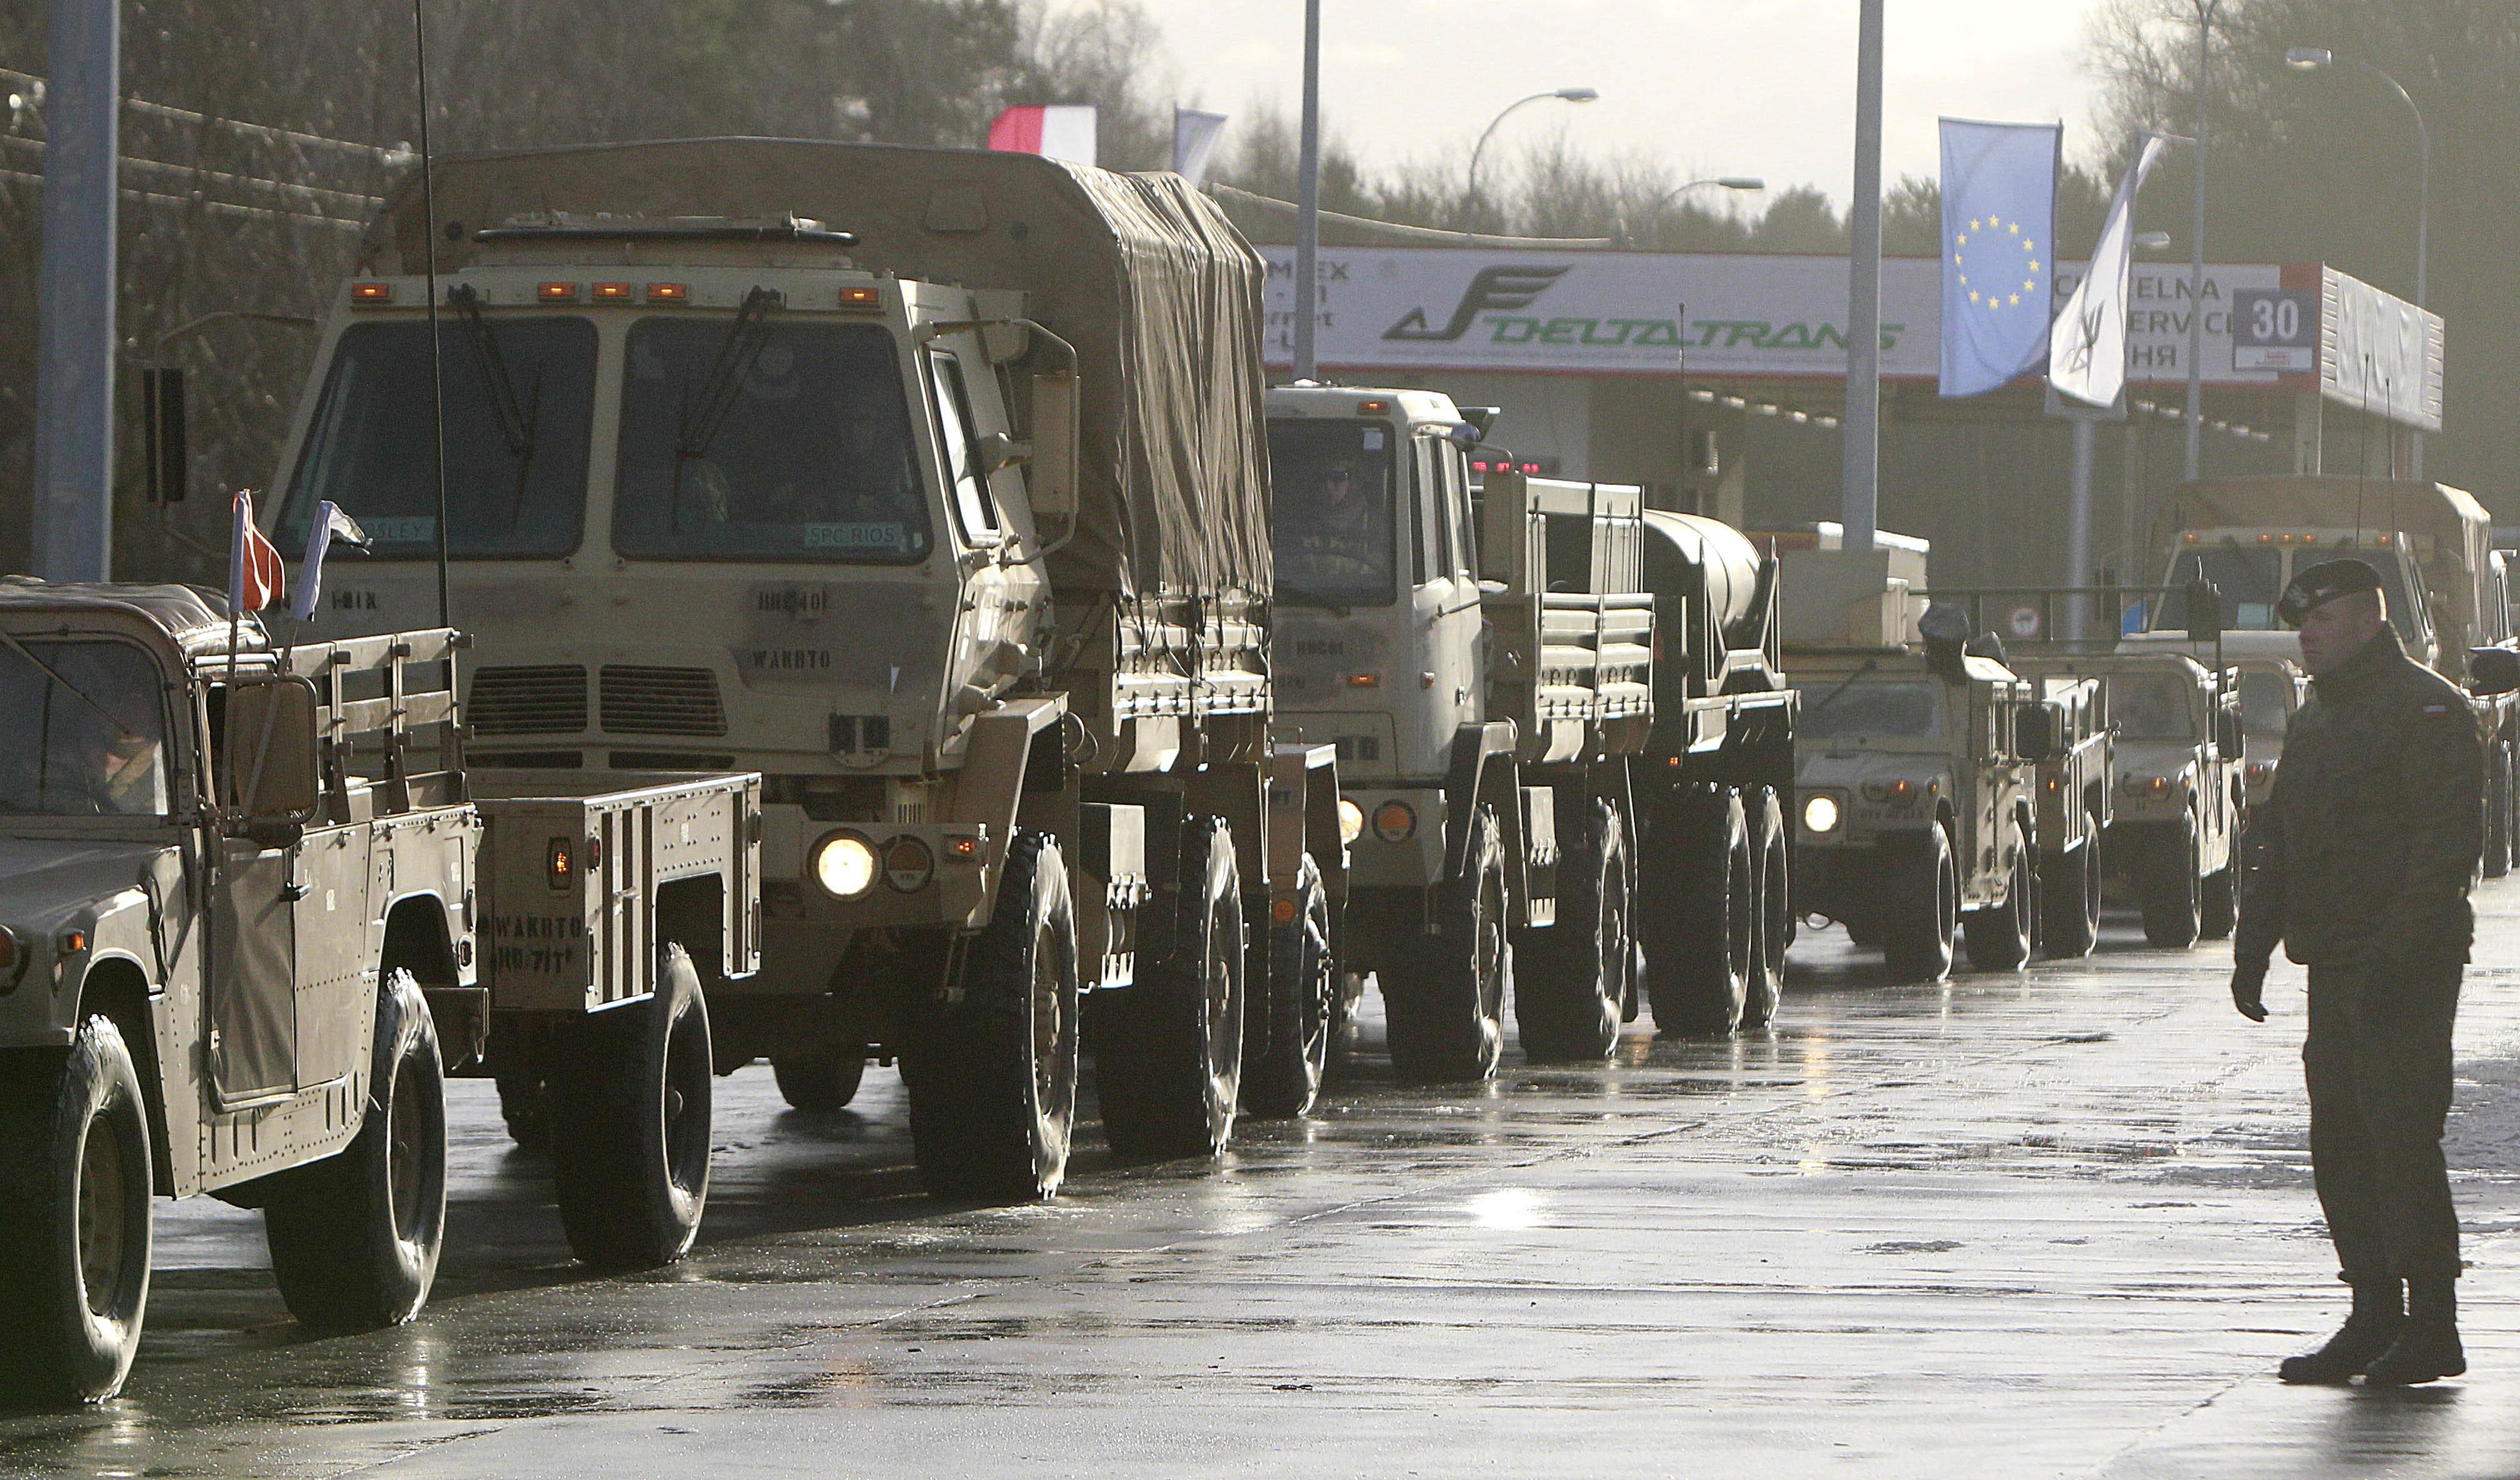 U.S. Army vehicles cross the Polish border in Olszyna, Poland, Thursday, Jan. 12, 2017 heading for their new base in Zagan